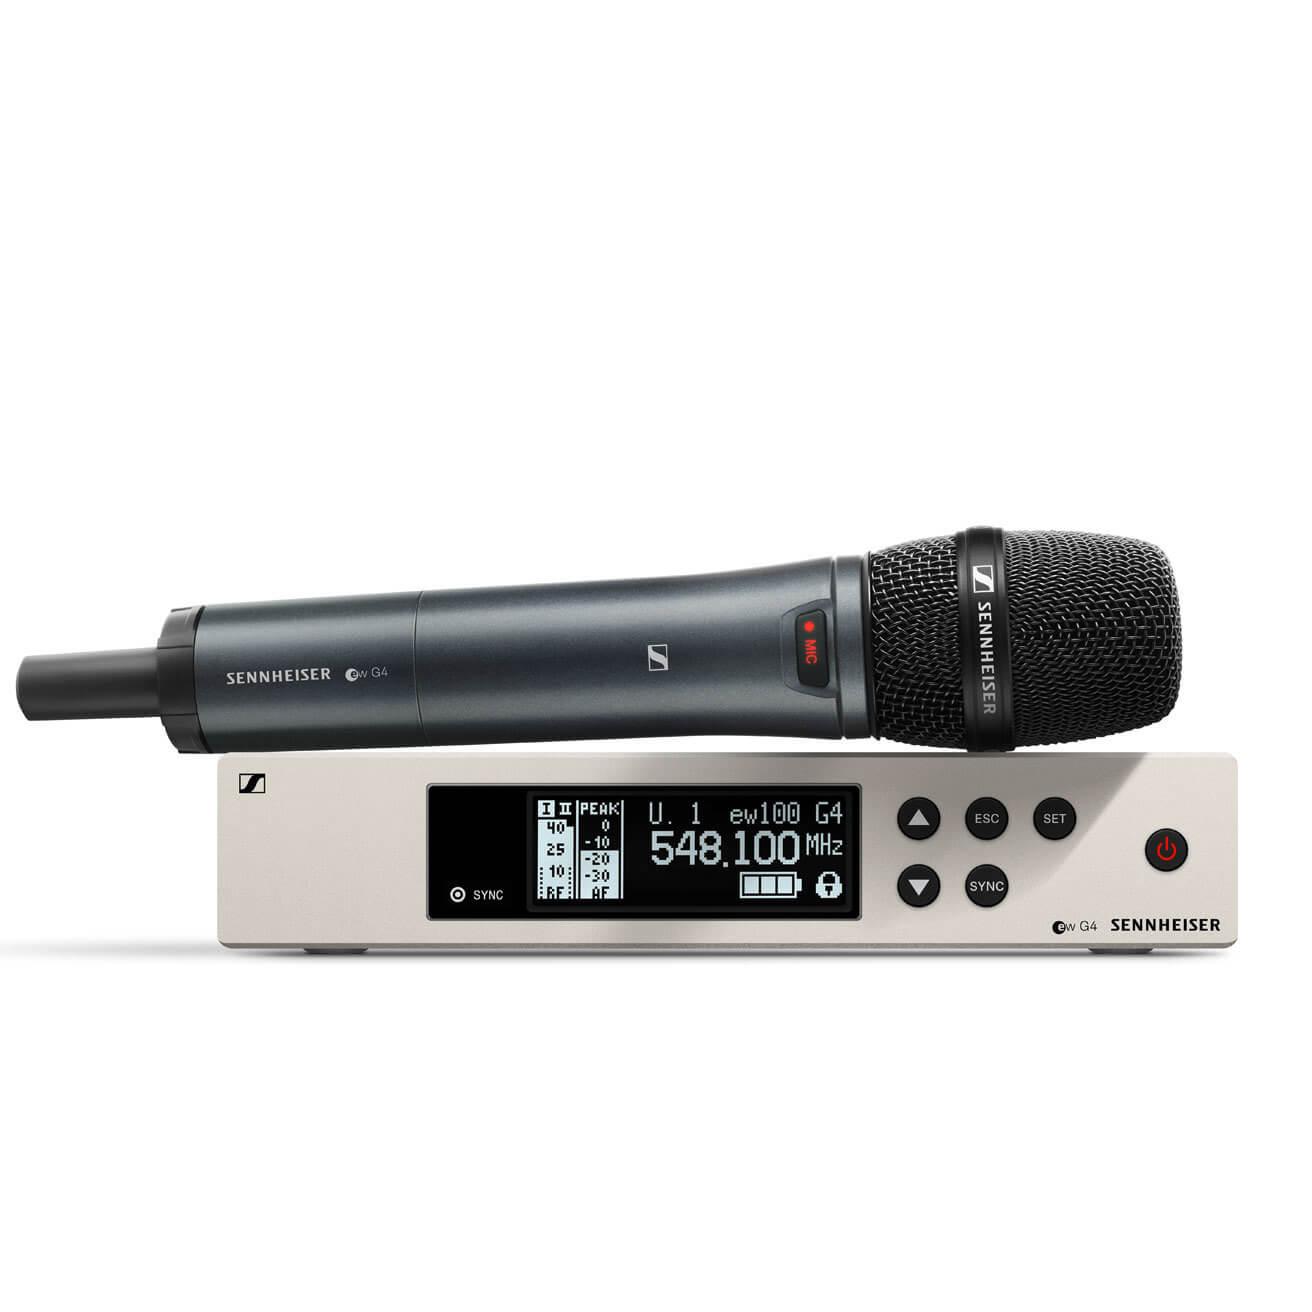 Afbeelding van Sennheiser ew 100 G4-835-S-B draadloze microfoon (626-668 MHz)